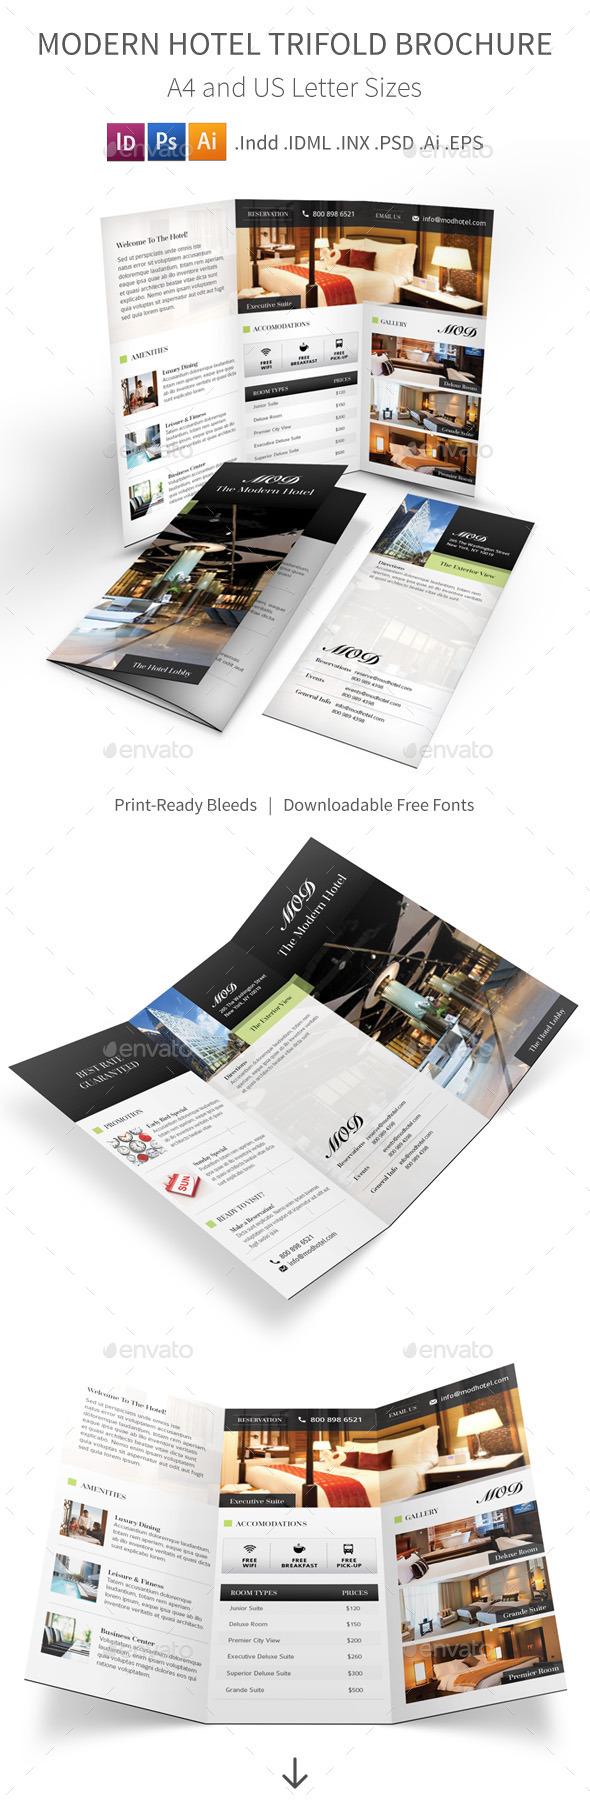 Modern Hotel Trifold Brochure - Informational Brochures